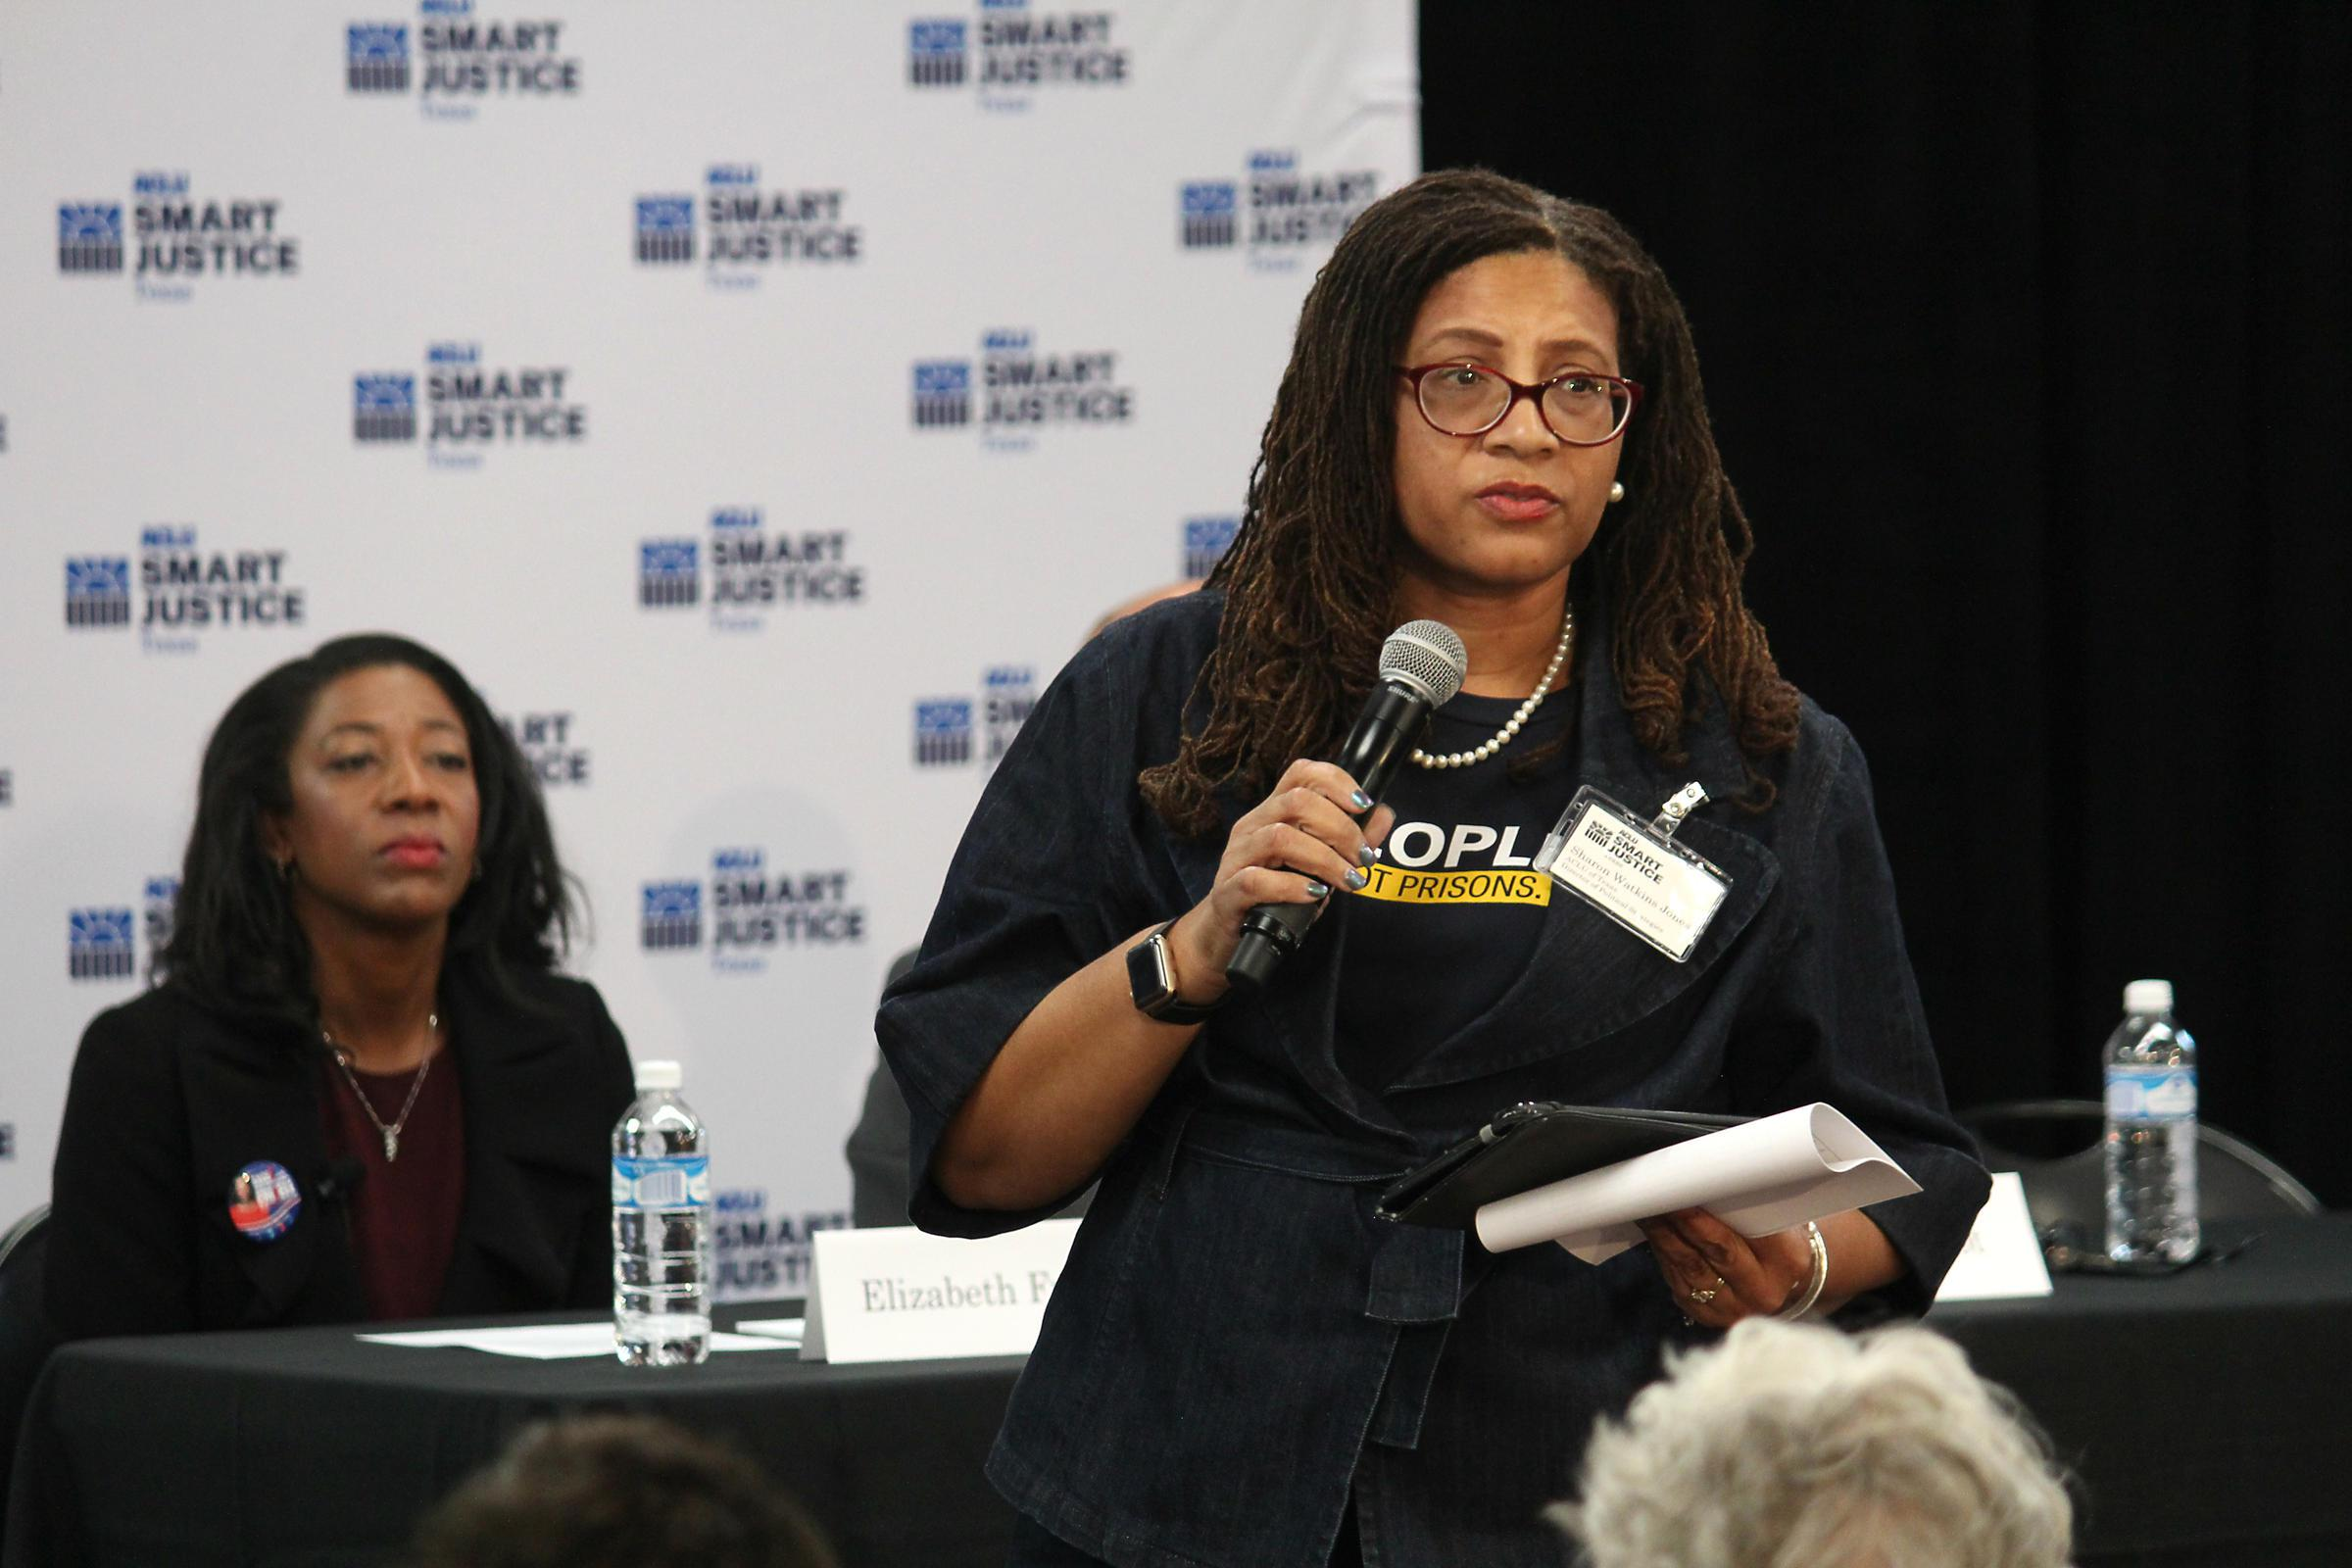 For Criminal Justice Advocates, Change Starts At The Bottom